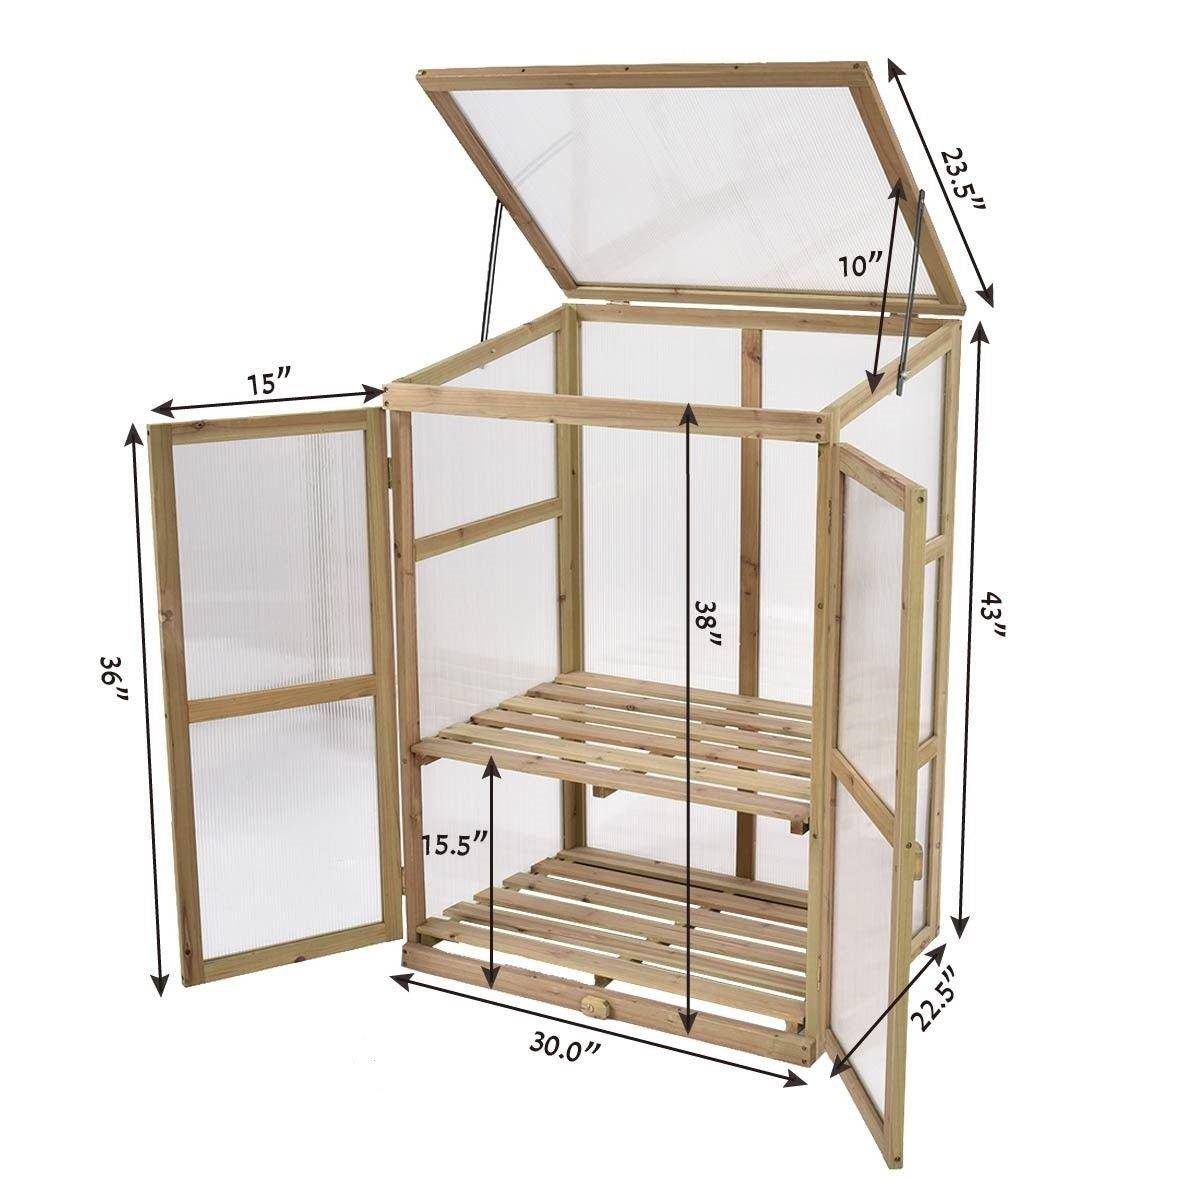 KCHEX/>Garden Portable Wooden Greenhouse Cold Frame Raised Plants ...